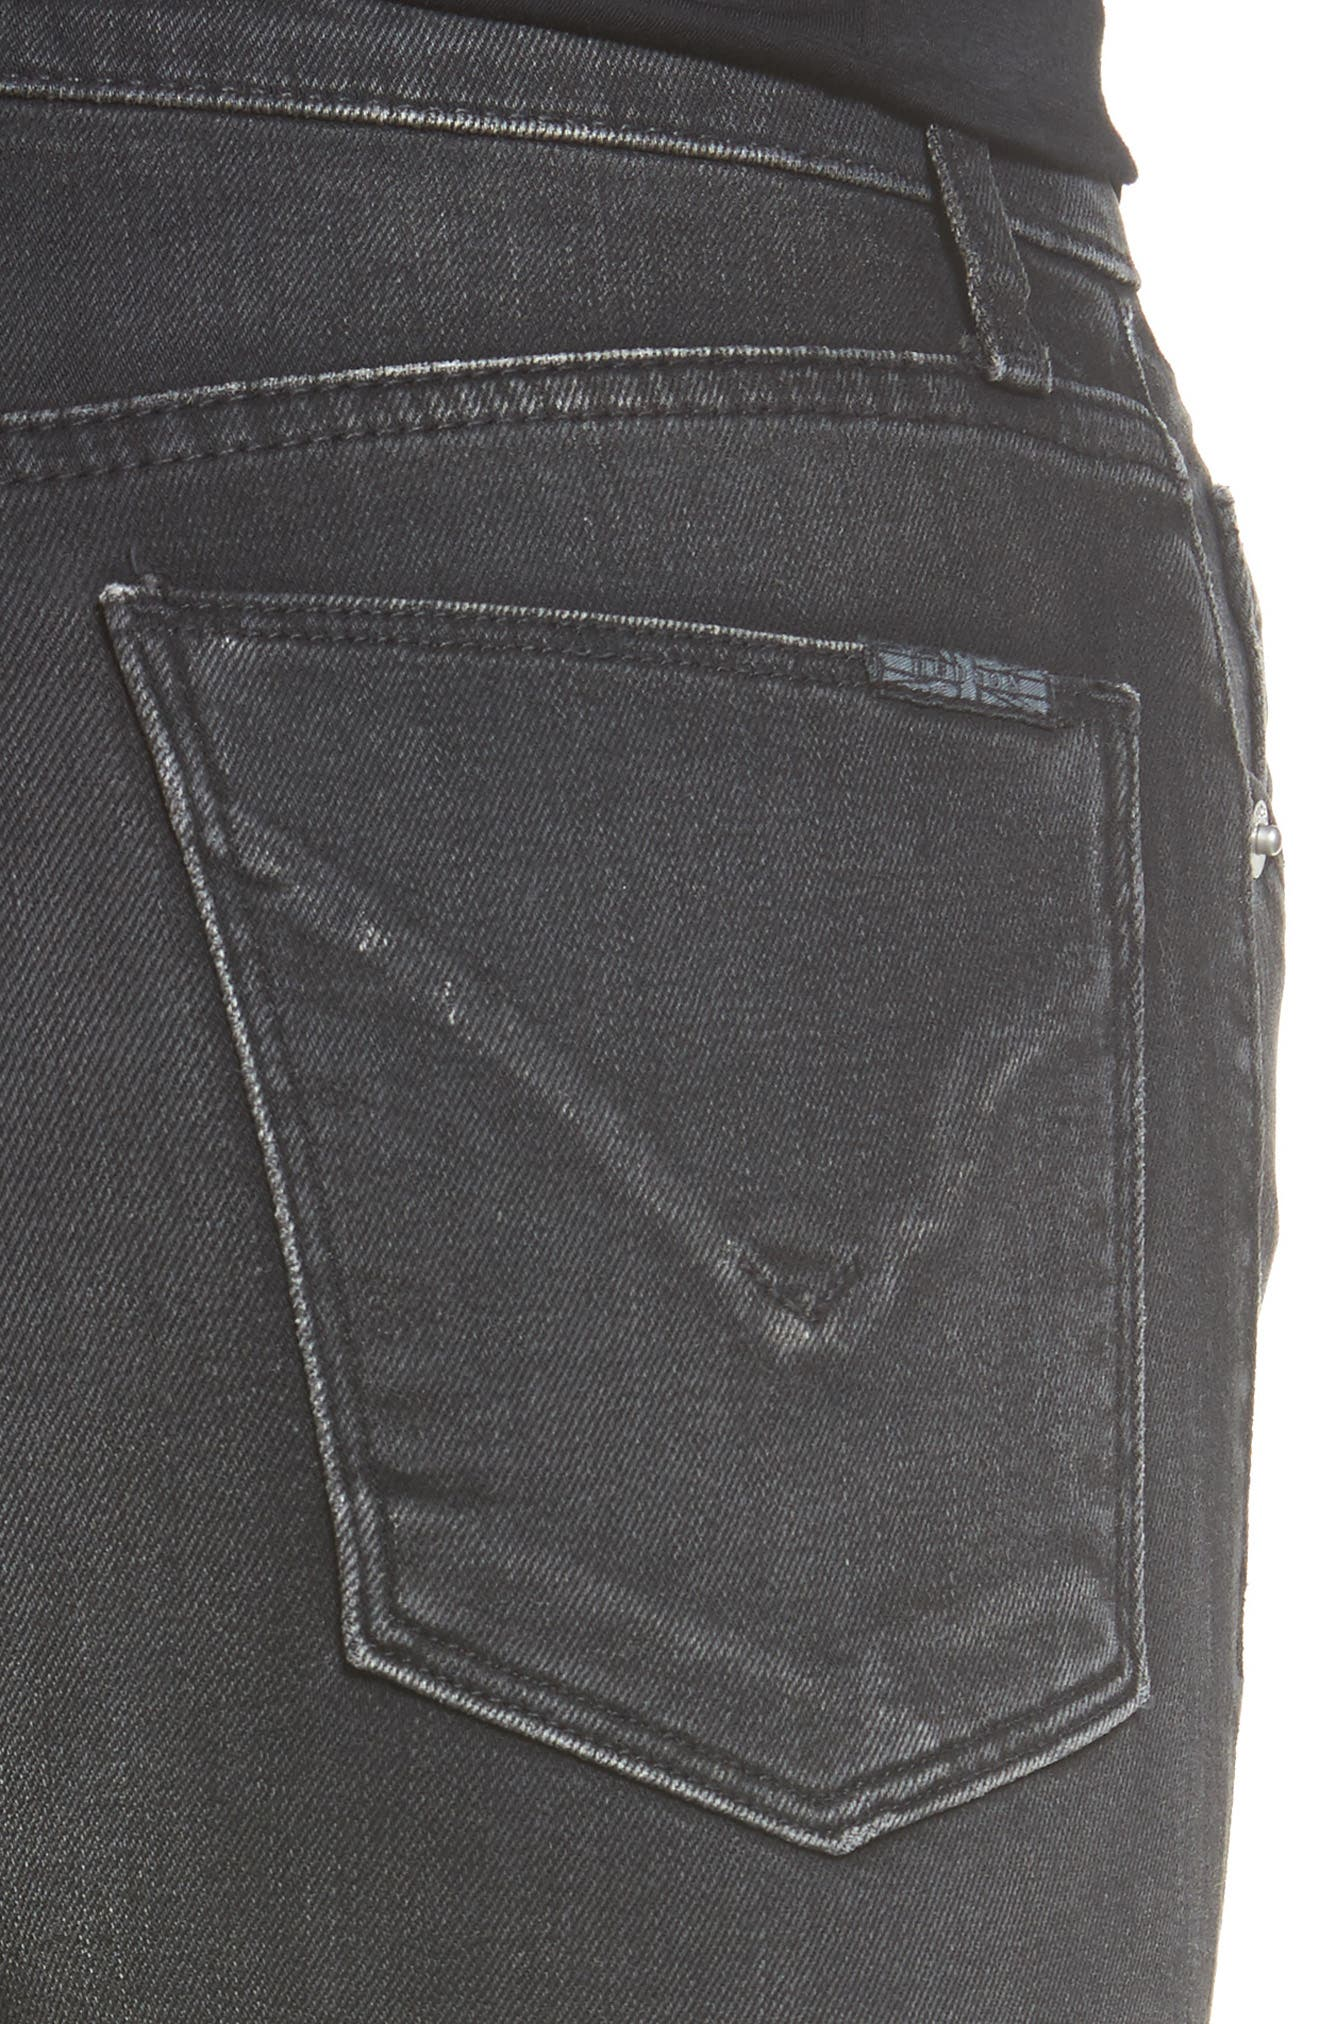 Heartbreaker High Waist Bootcut Jeans,                             Alternate thumbnail 5, color,                             Abandon